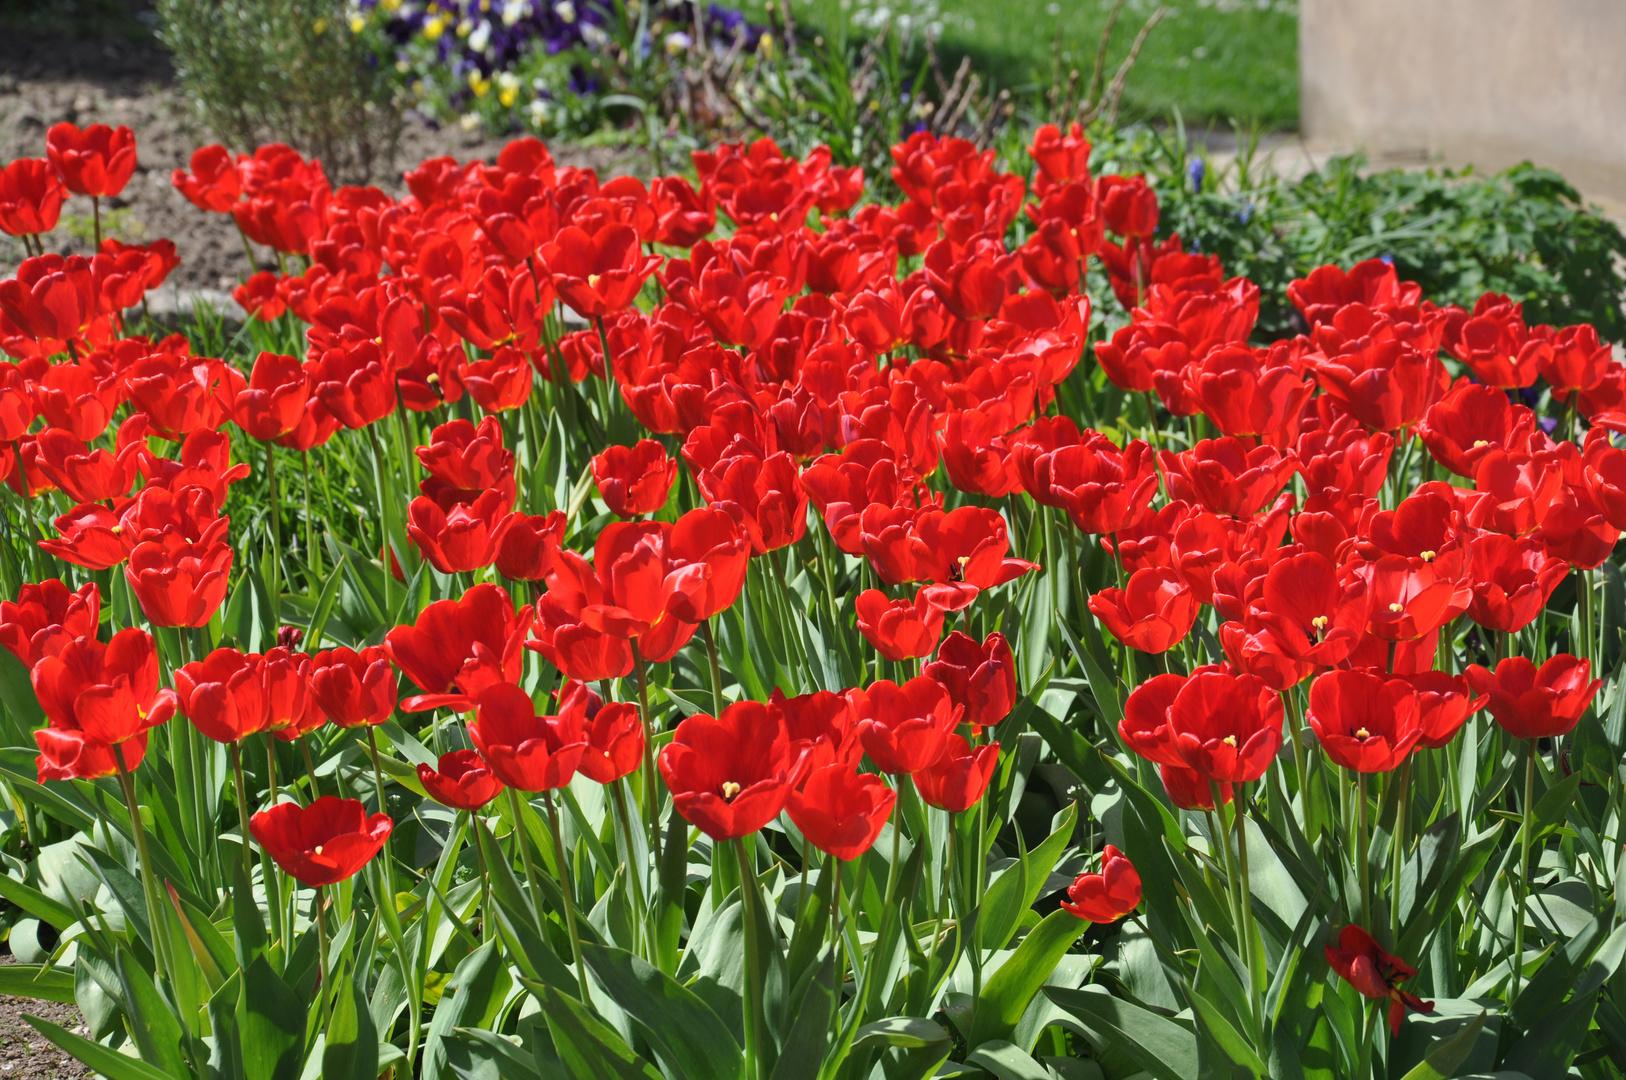 tulpen von unseren nachbargarten foto bild pflanzen pilze flechten bl ten. Black Bedroom Furniture Sets. Home Design Ideas